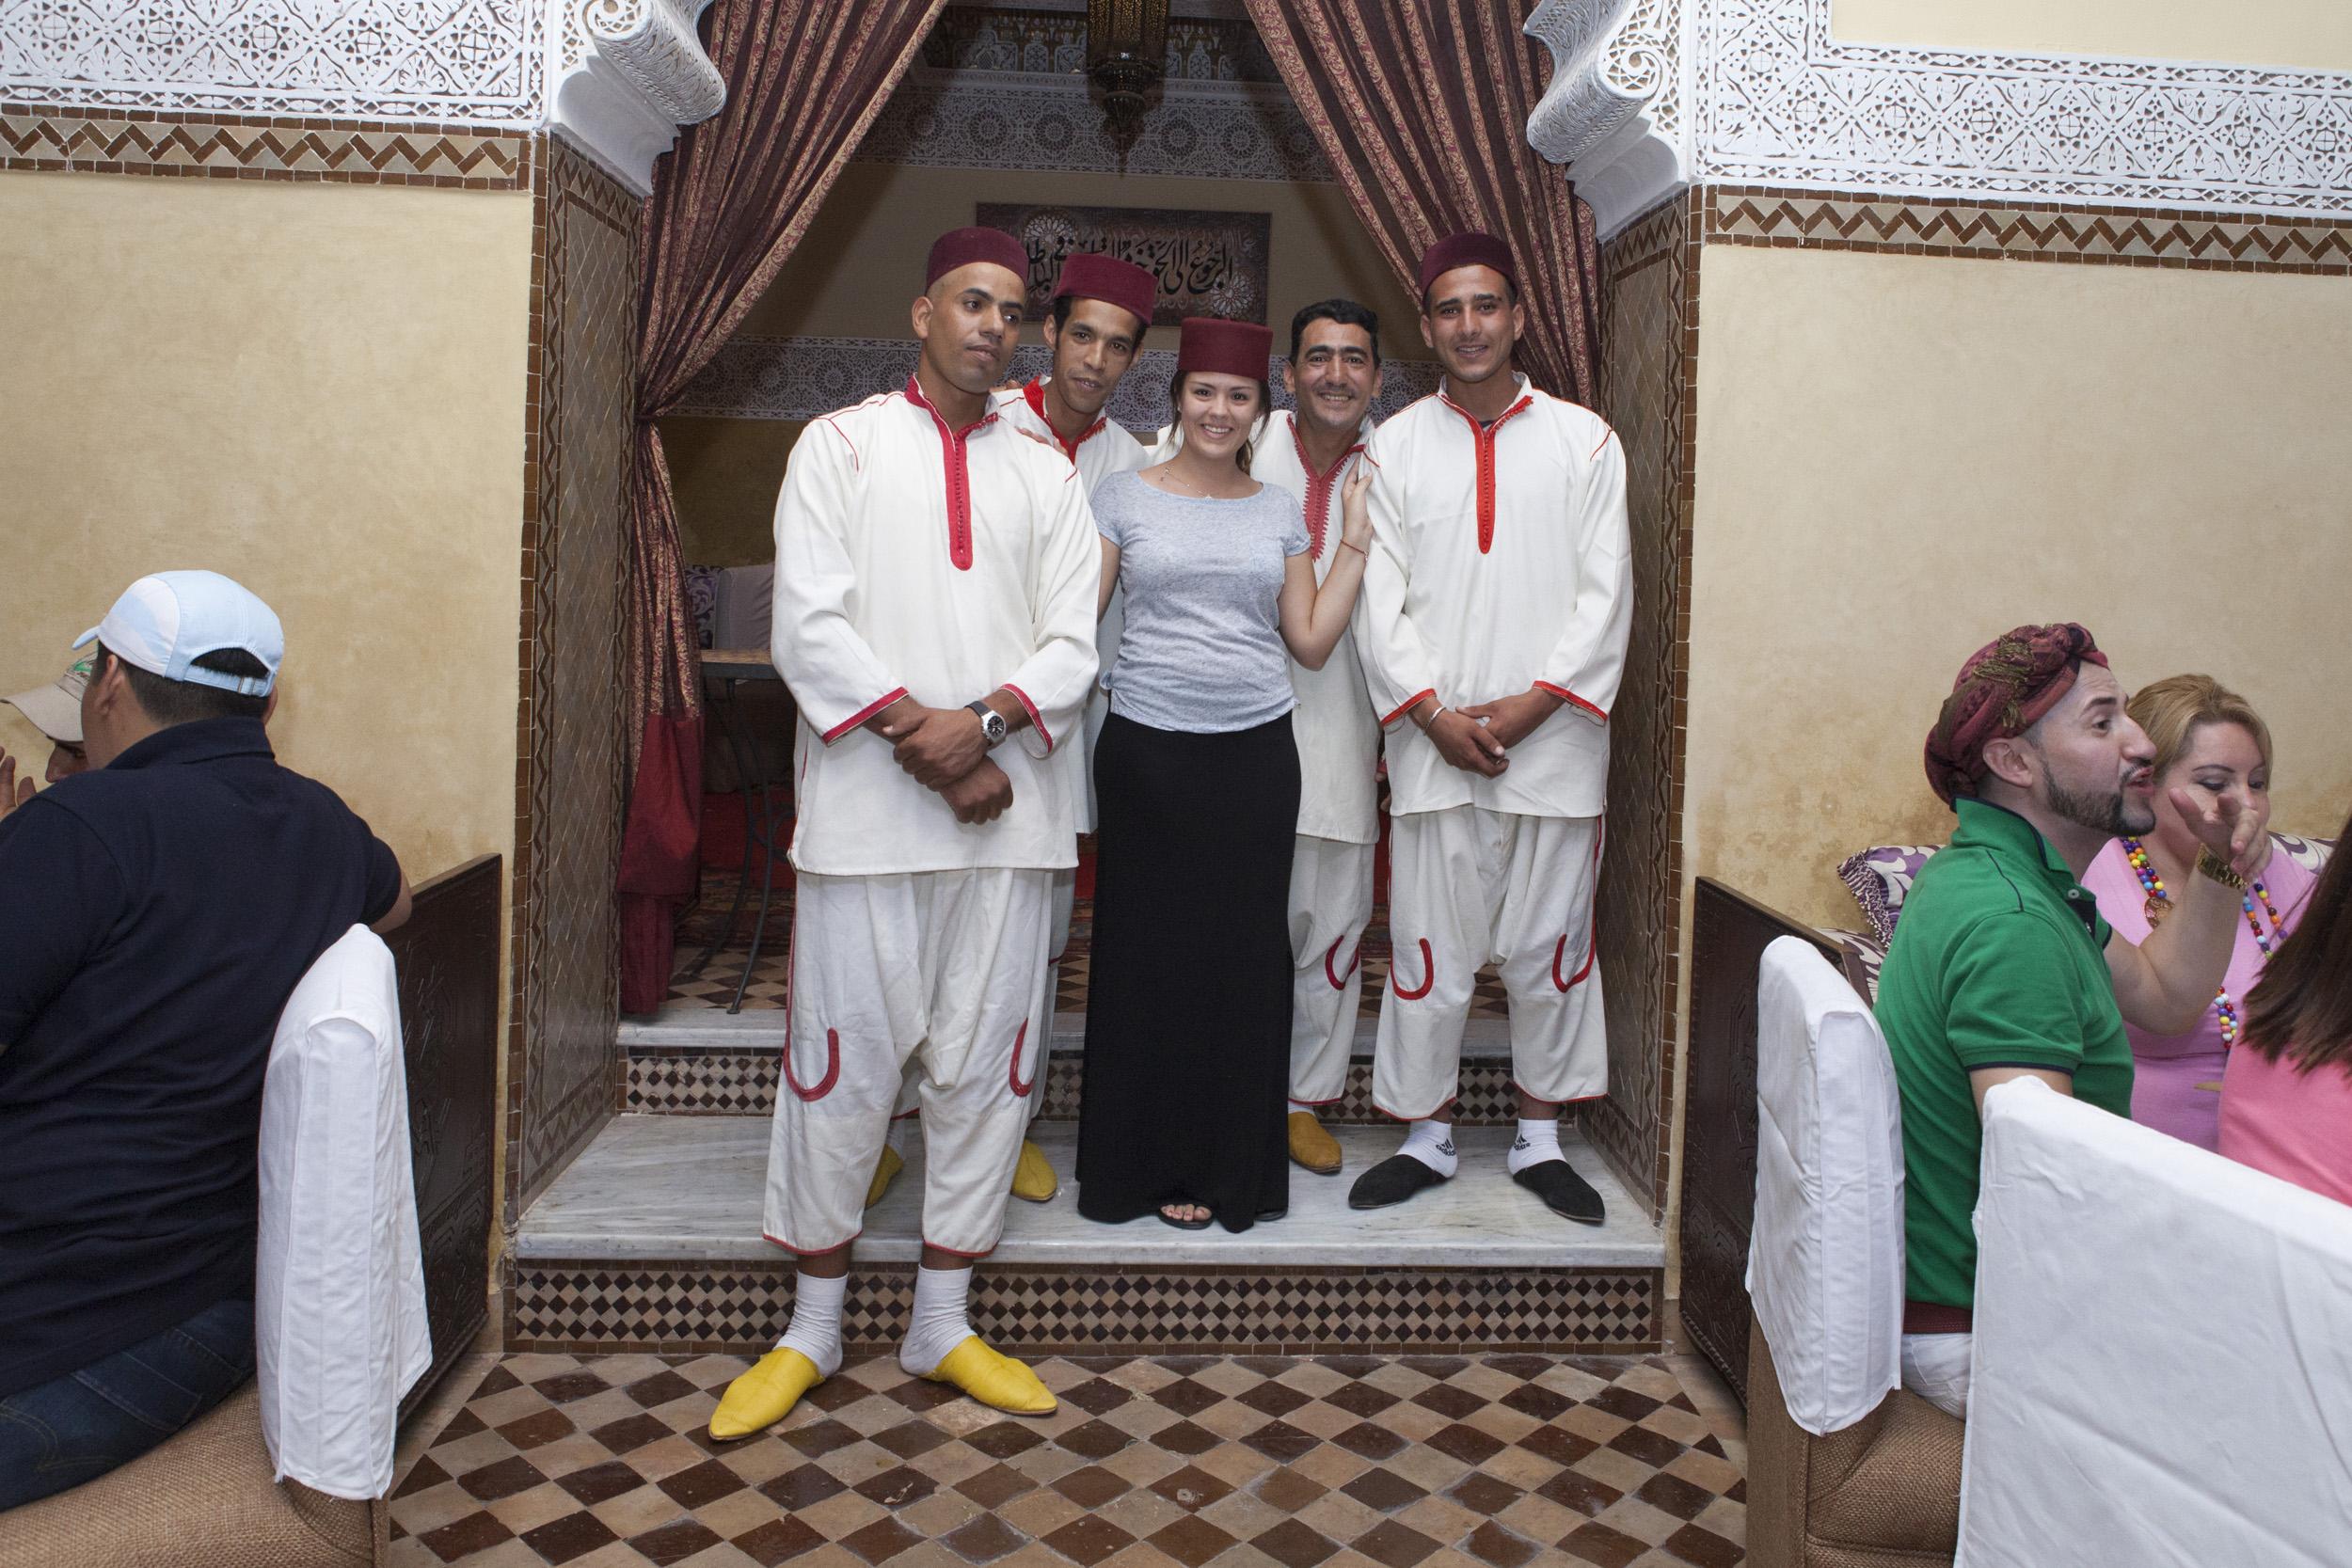 marrakech_2_convencion_anual_salerm_cosmetics_proline_16